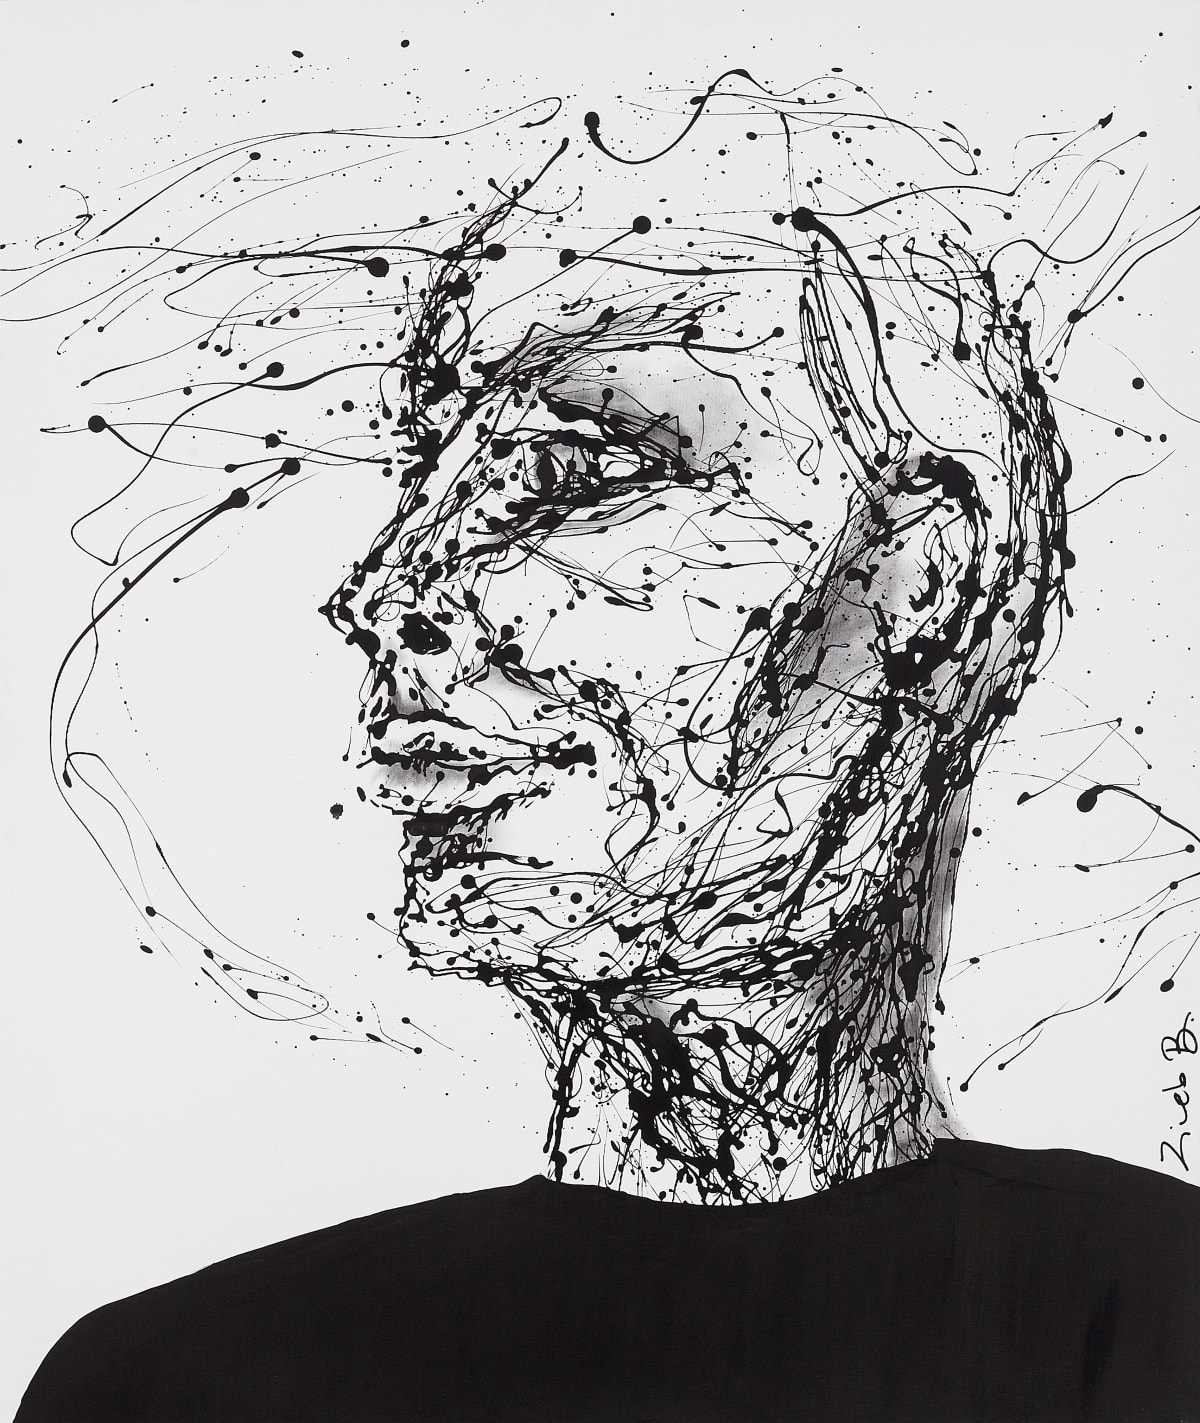 zineb bennis, Pensées, 2018